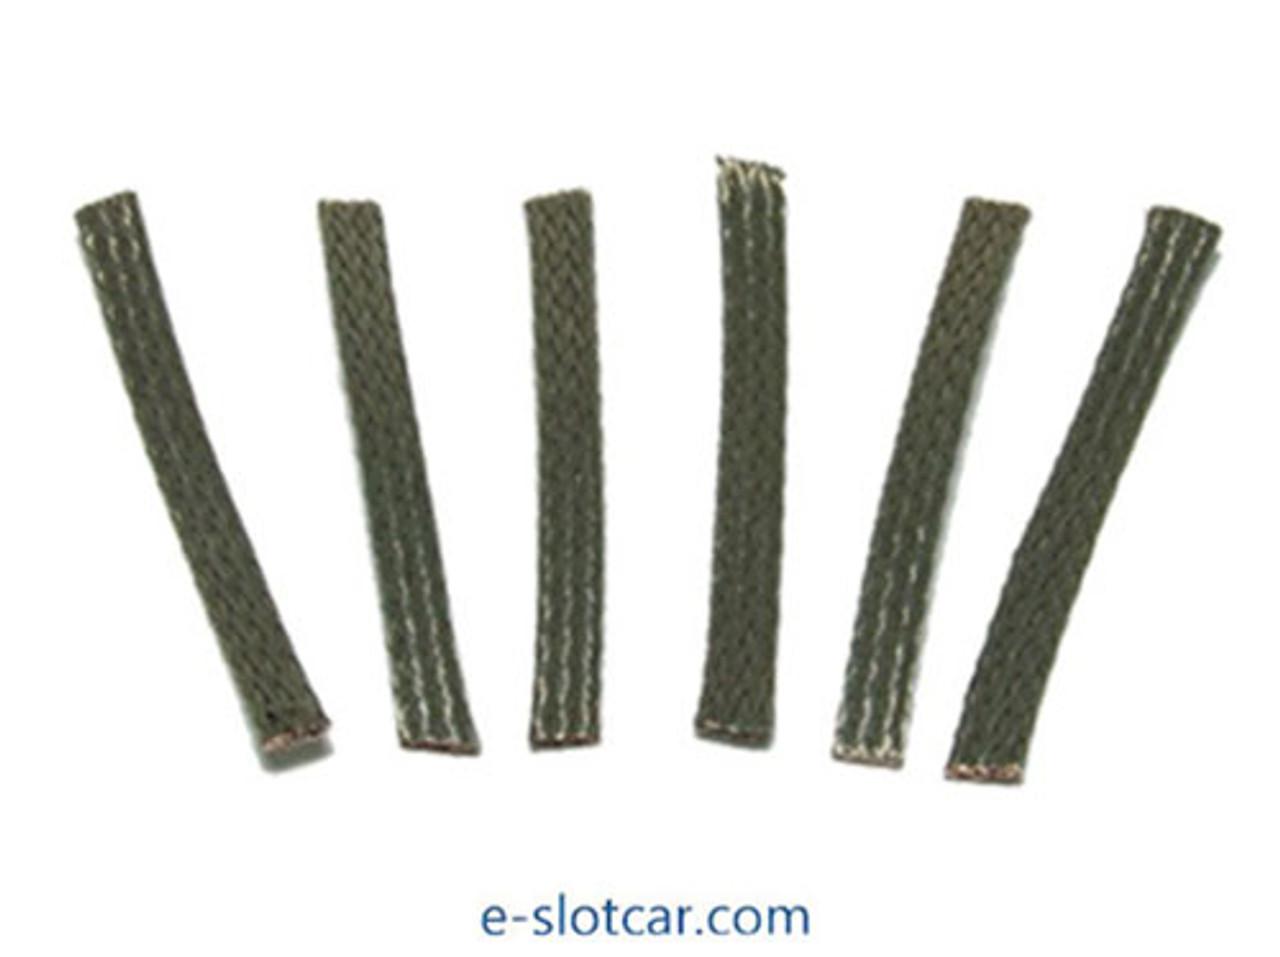 Scalextric Braid Pack - 3 pr. - SCL-C8075